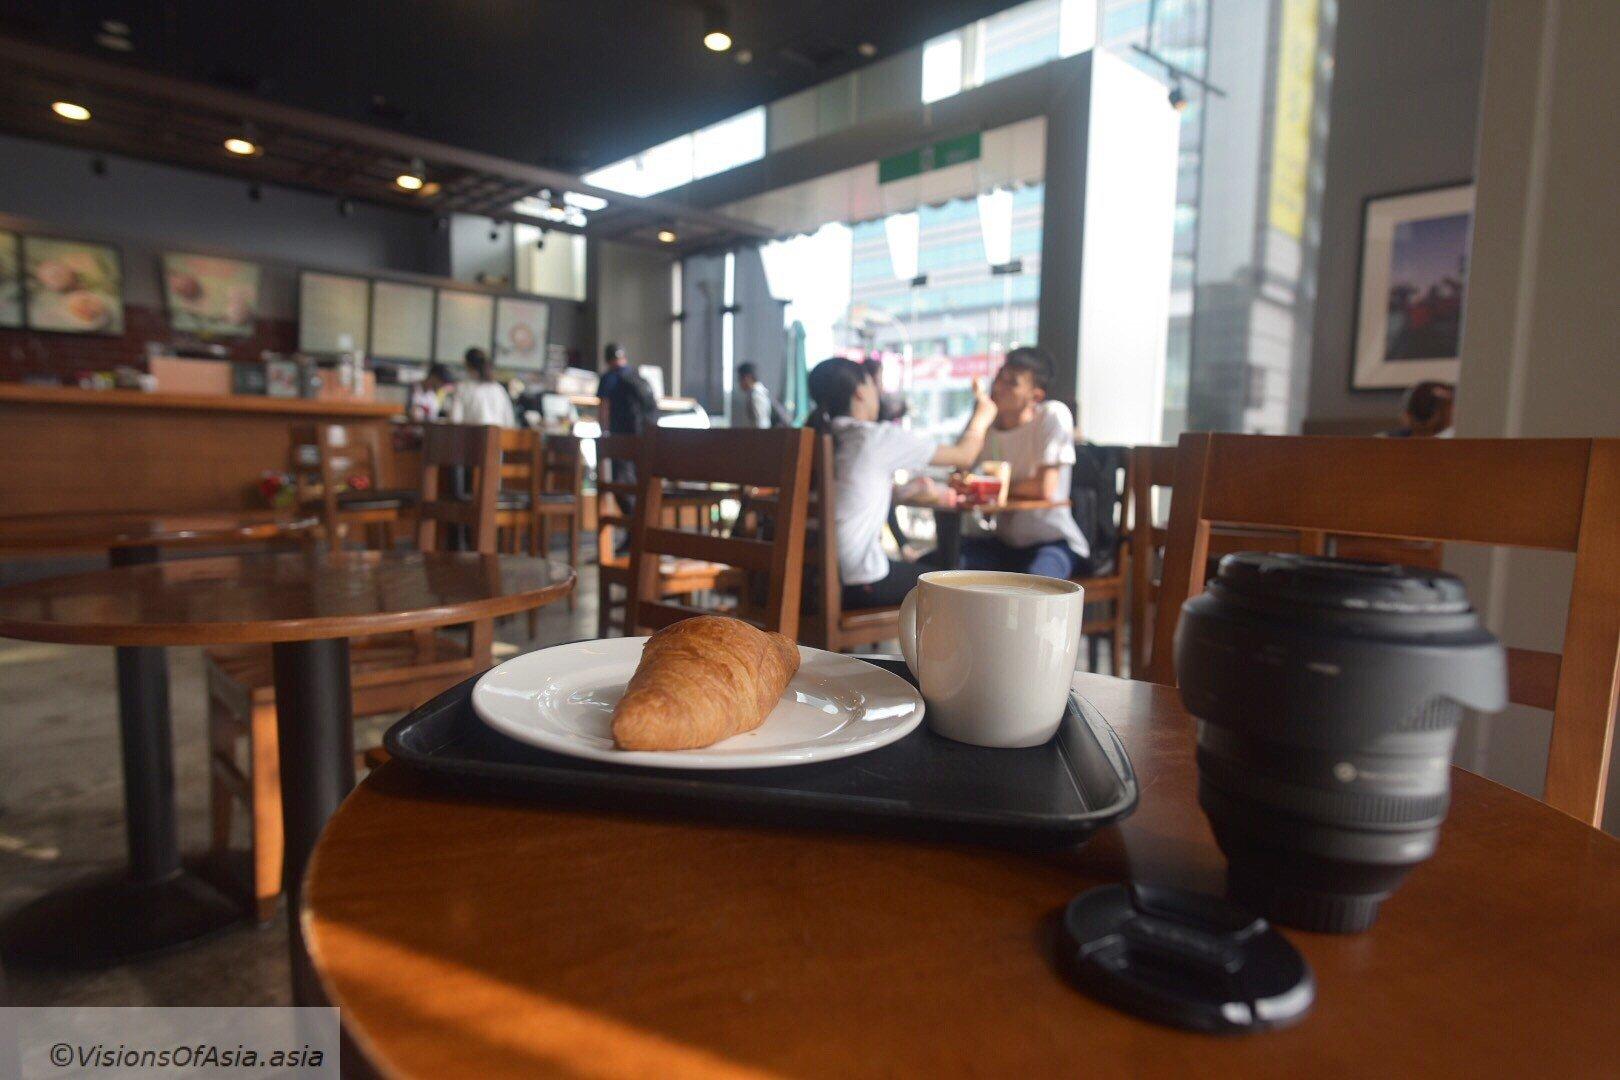 Bfast at Starbucks